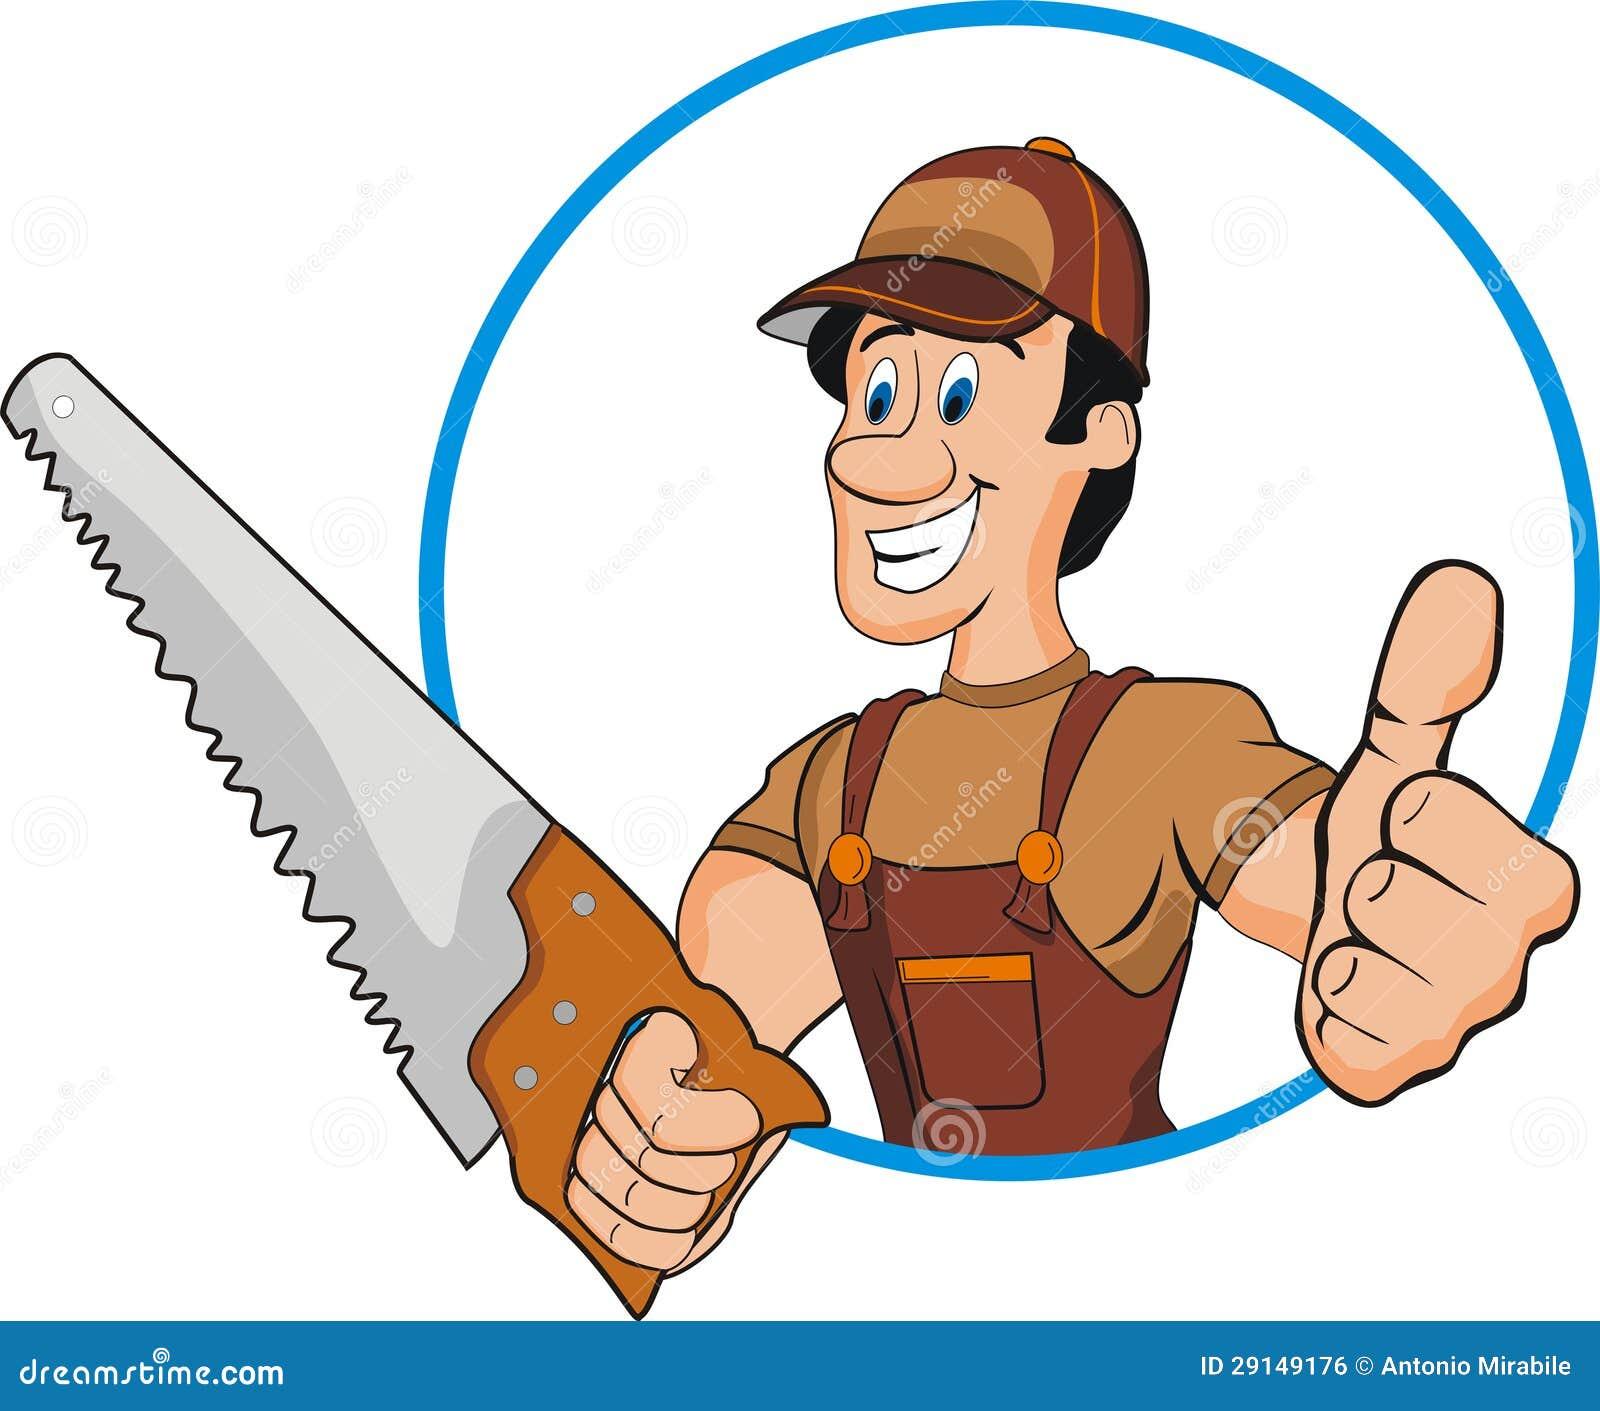 Cabinet Maker Clip Art: Carpenter Stock Vector. Illustration Of Parole, Character